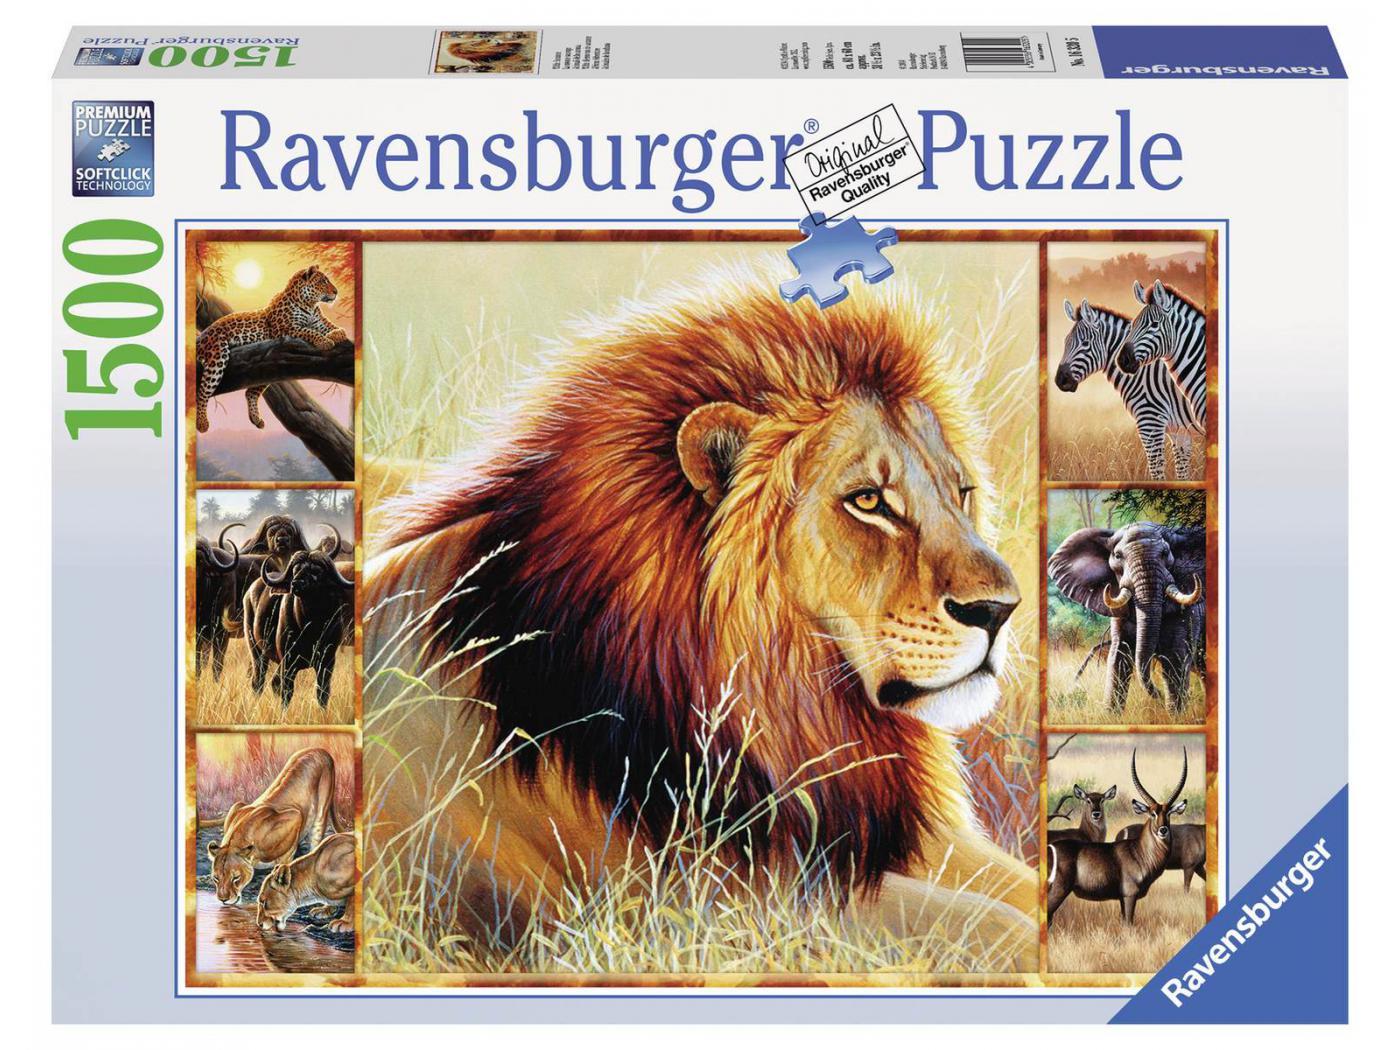 ravensburger puzzle 1500 pi ces la savane sauvage. Black Bedroom Furniture Sets. Home Design Ideas